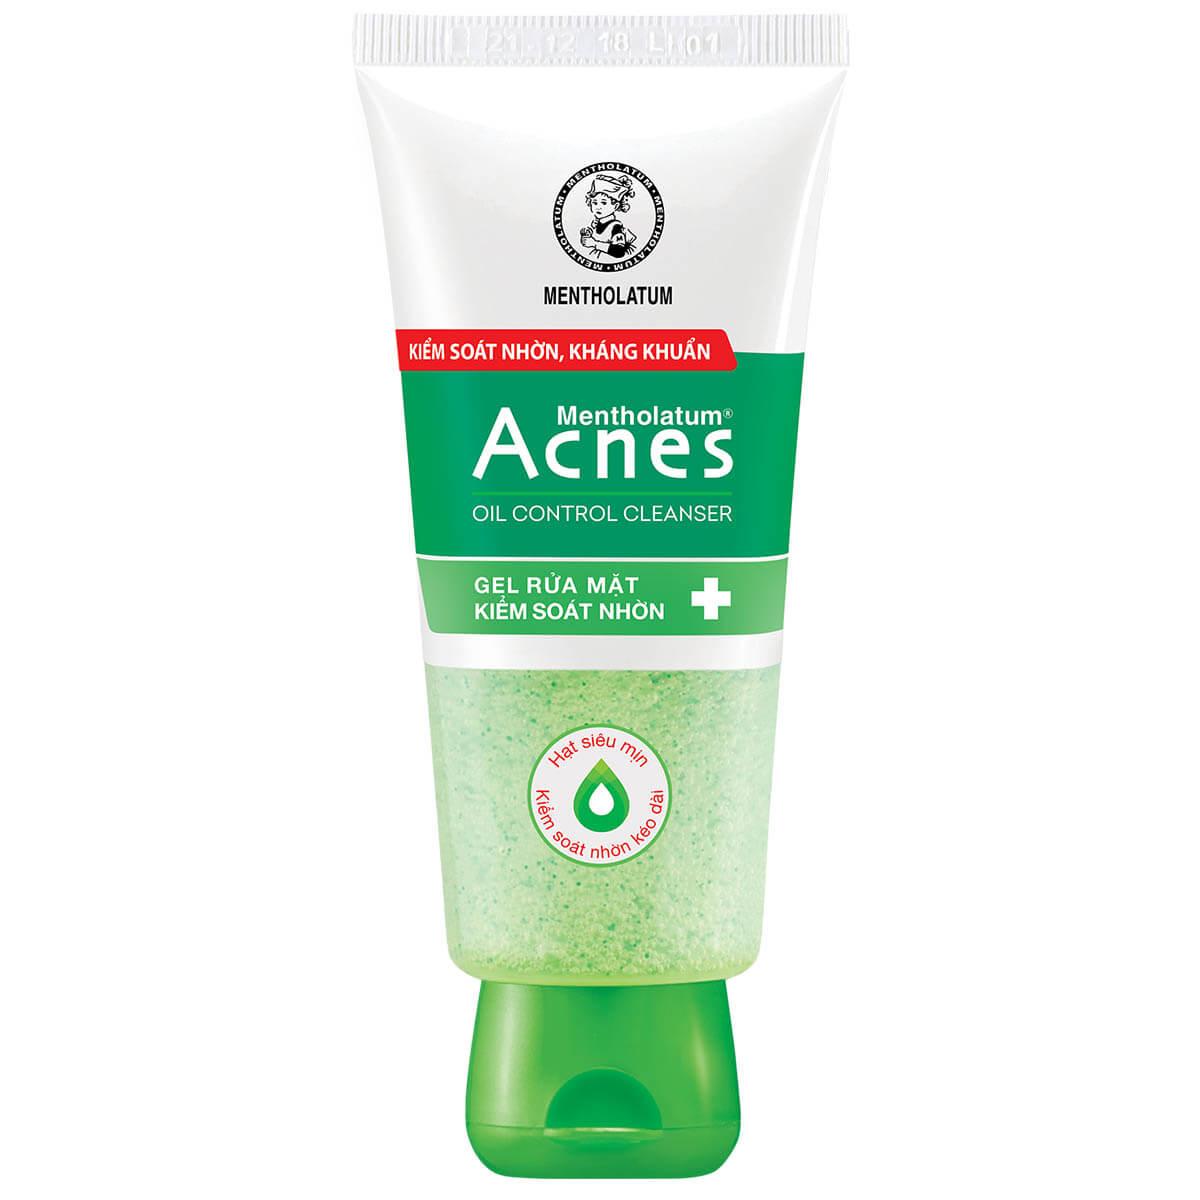 Gel rửa mặt kiểm soát nhờn Acnes Oil Control Cleanser tuýp 100g